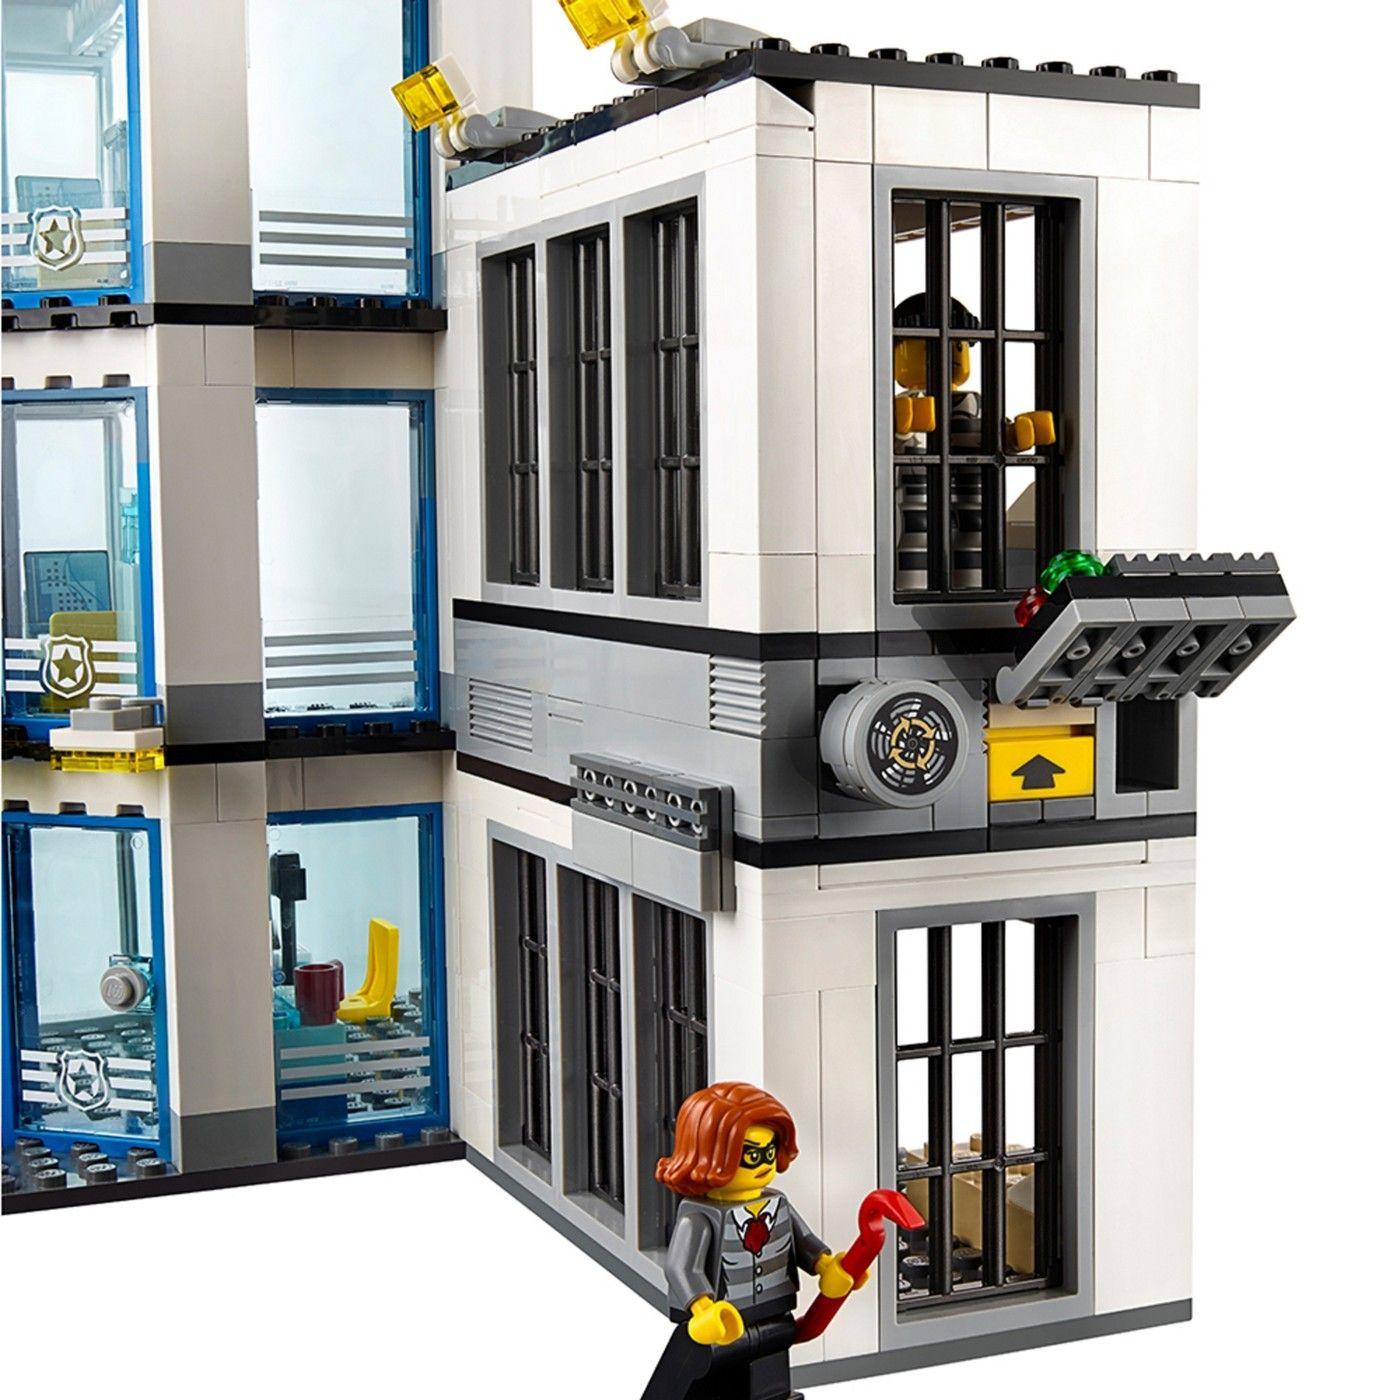 Lego City Police Police Station 60141 Affiliate City Ad Lego Police Lego City Police Police Station Lego Police Station